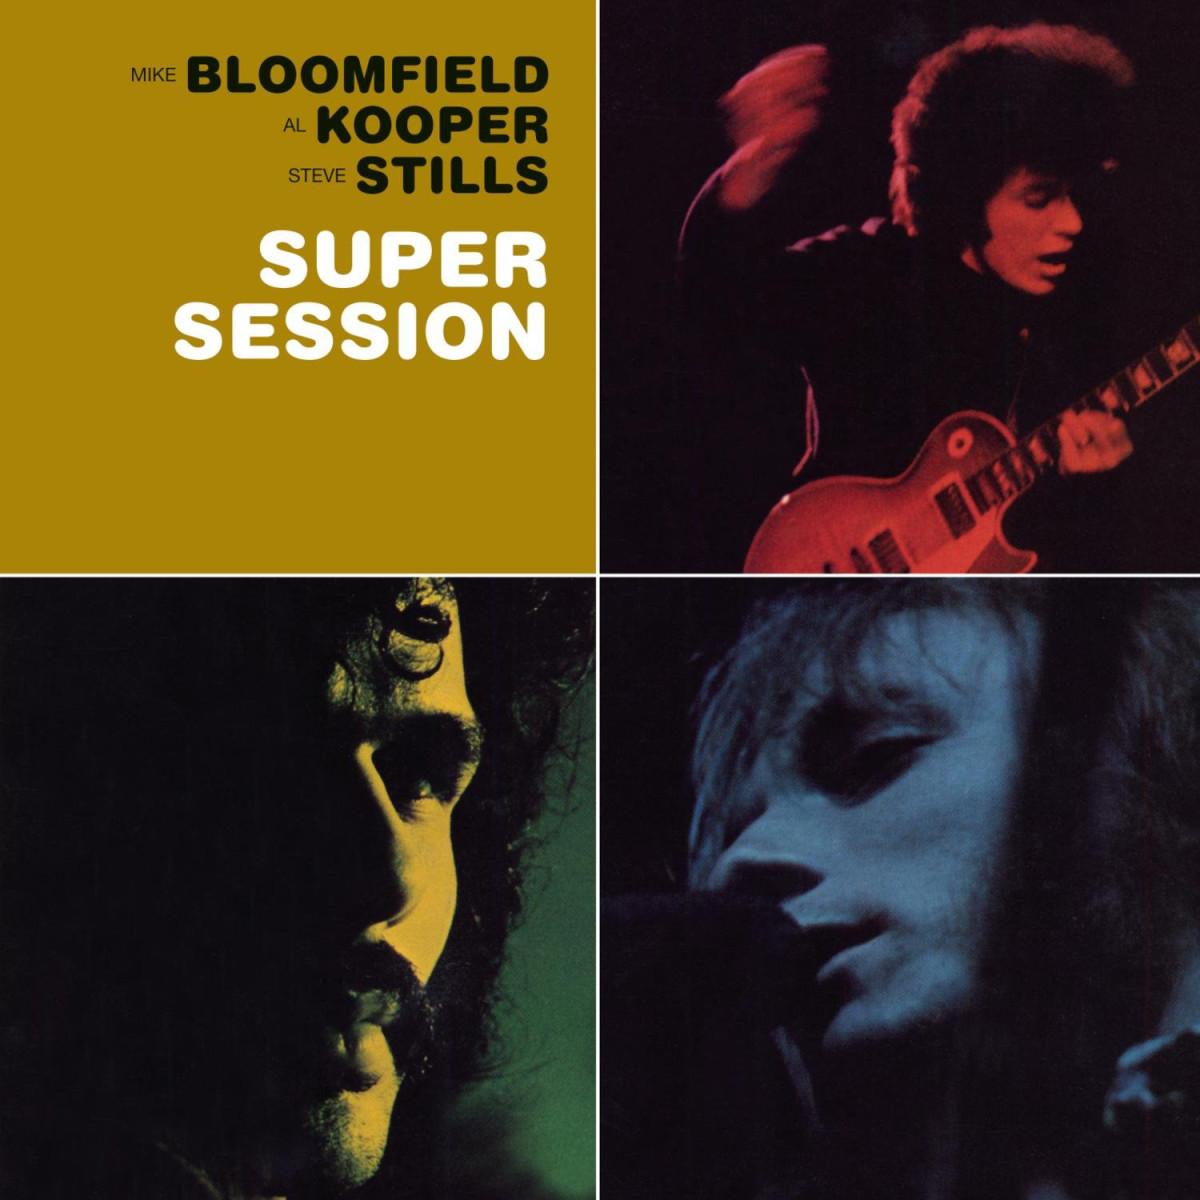 Mike Bloomfield, Al Kooper and Stephen Stills, Super Session